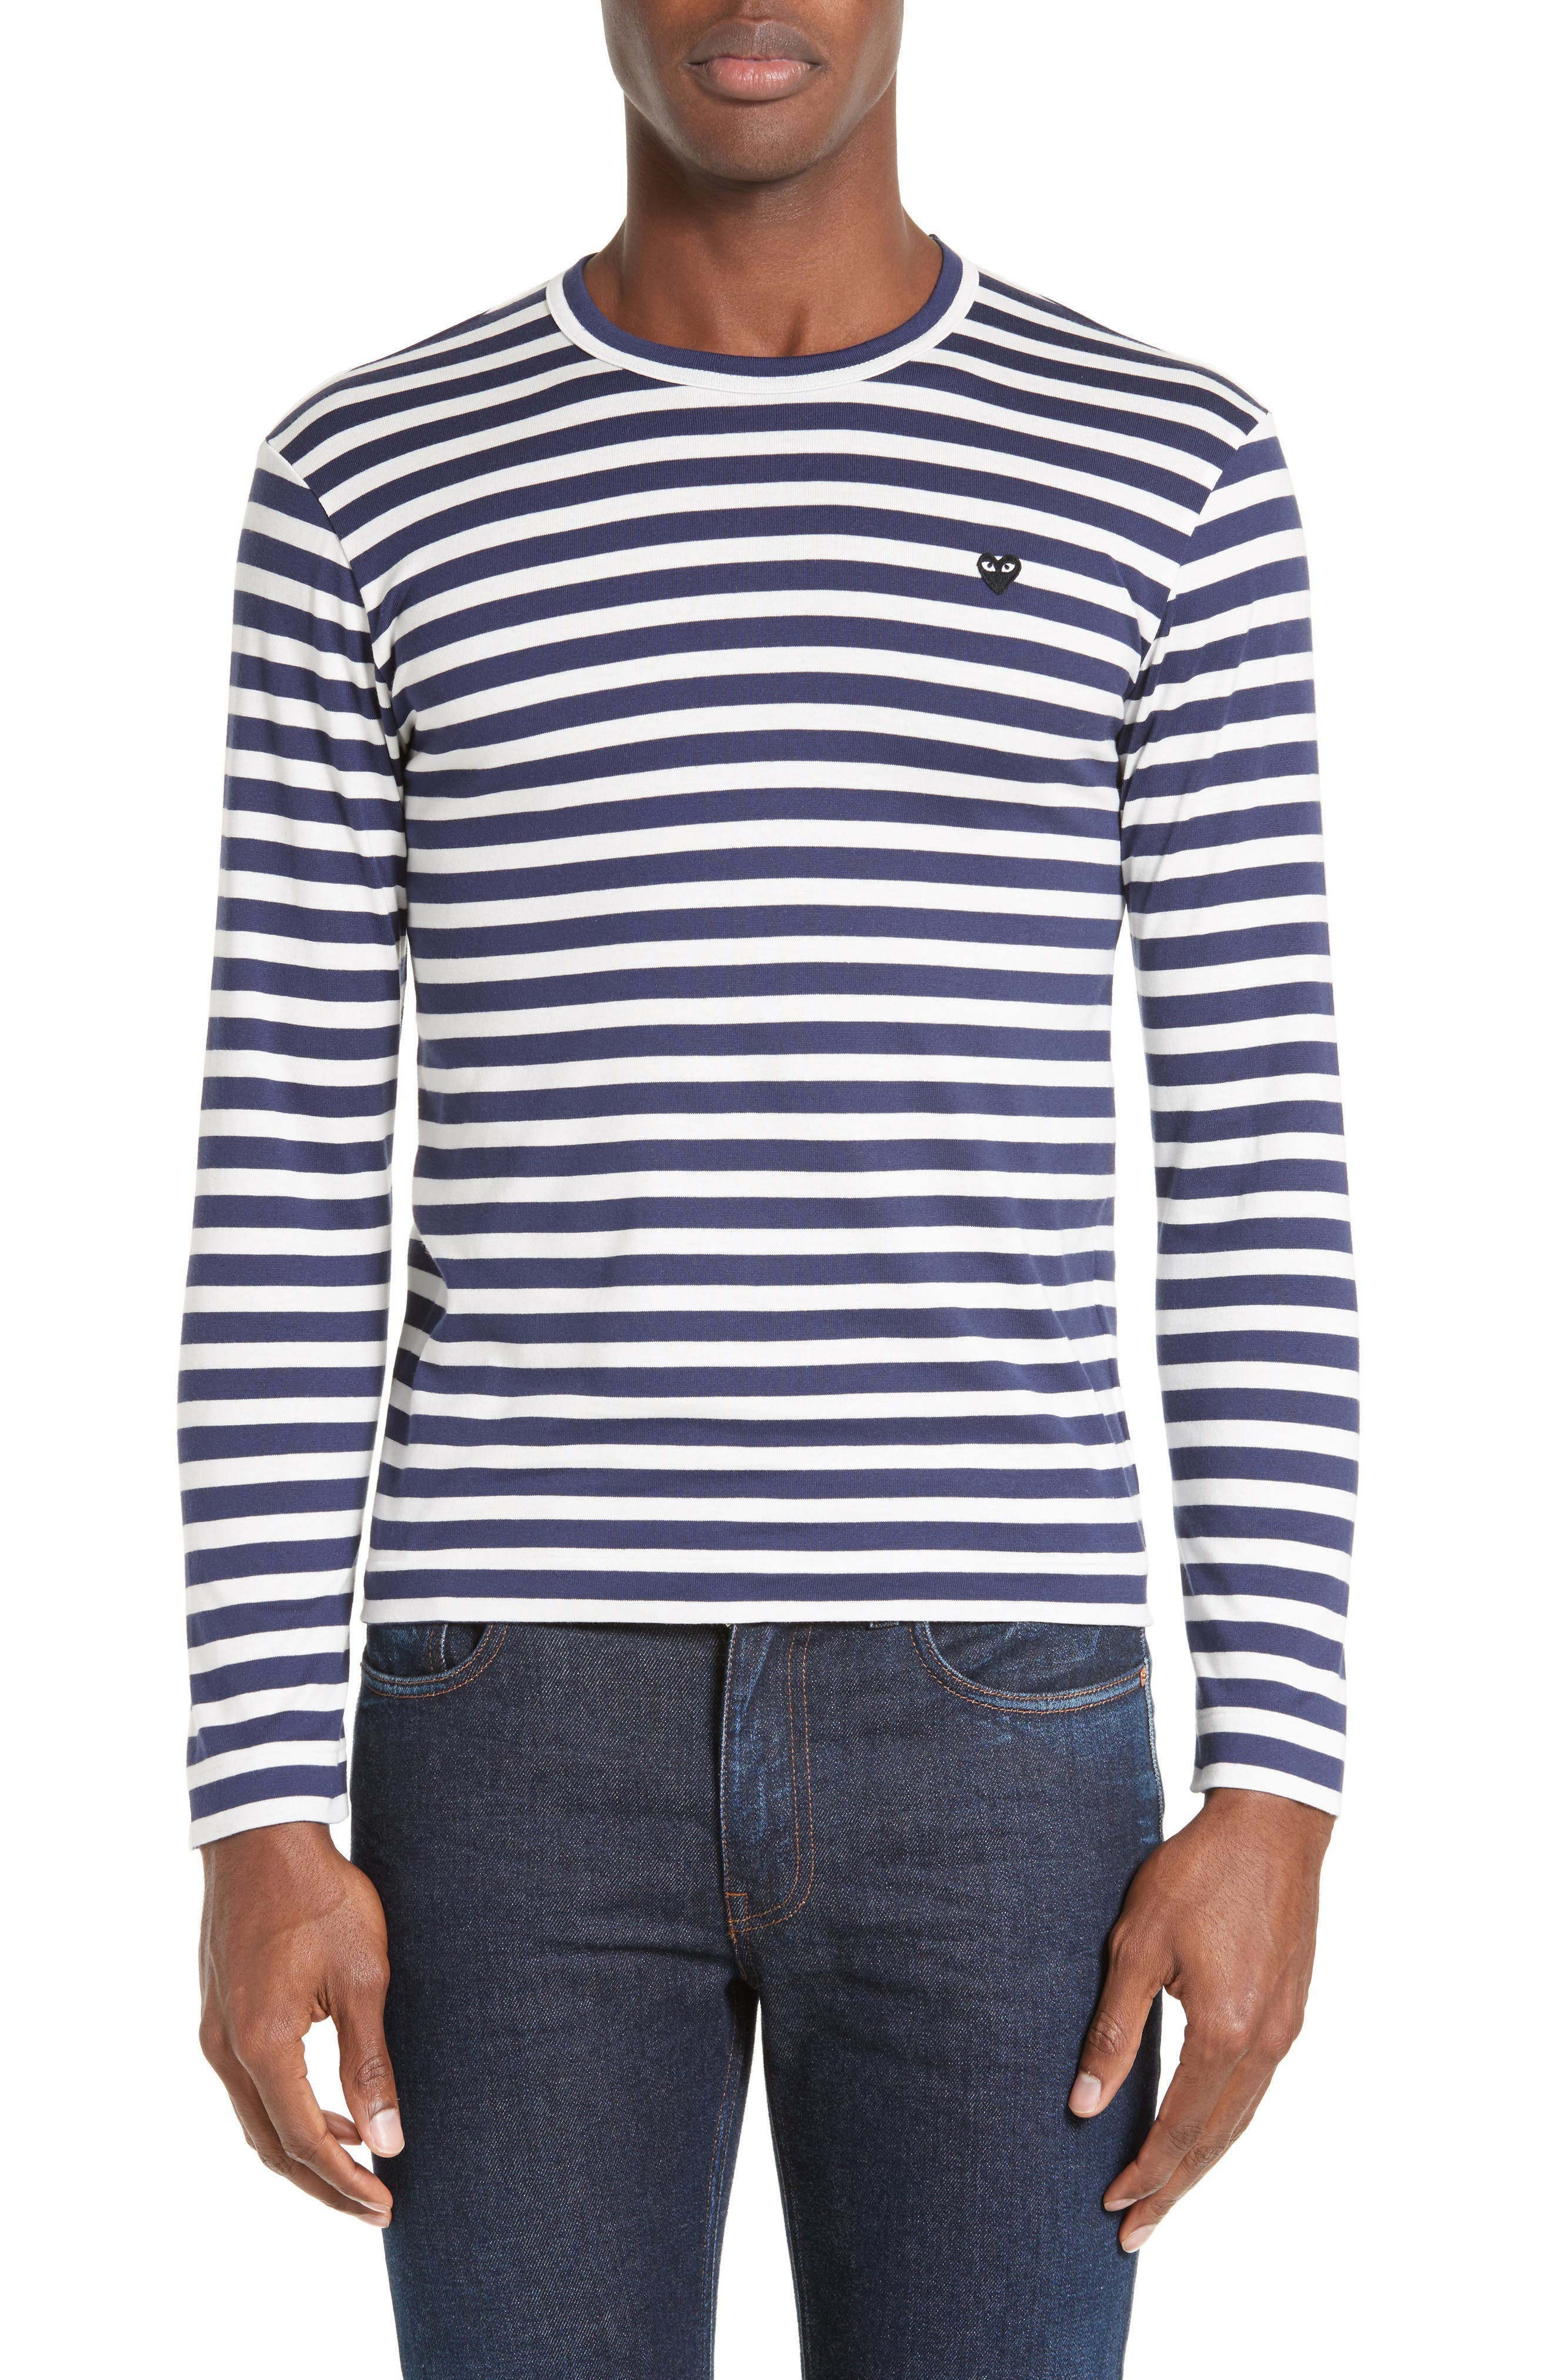 PLAY Stripe T-Shirt,                             Main thumbnail 1, color,